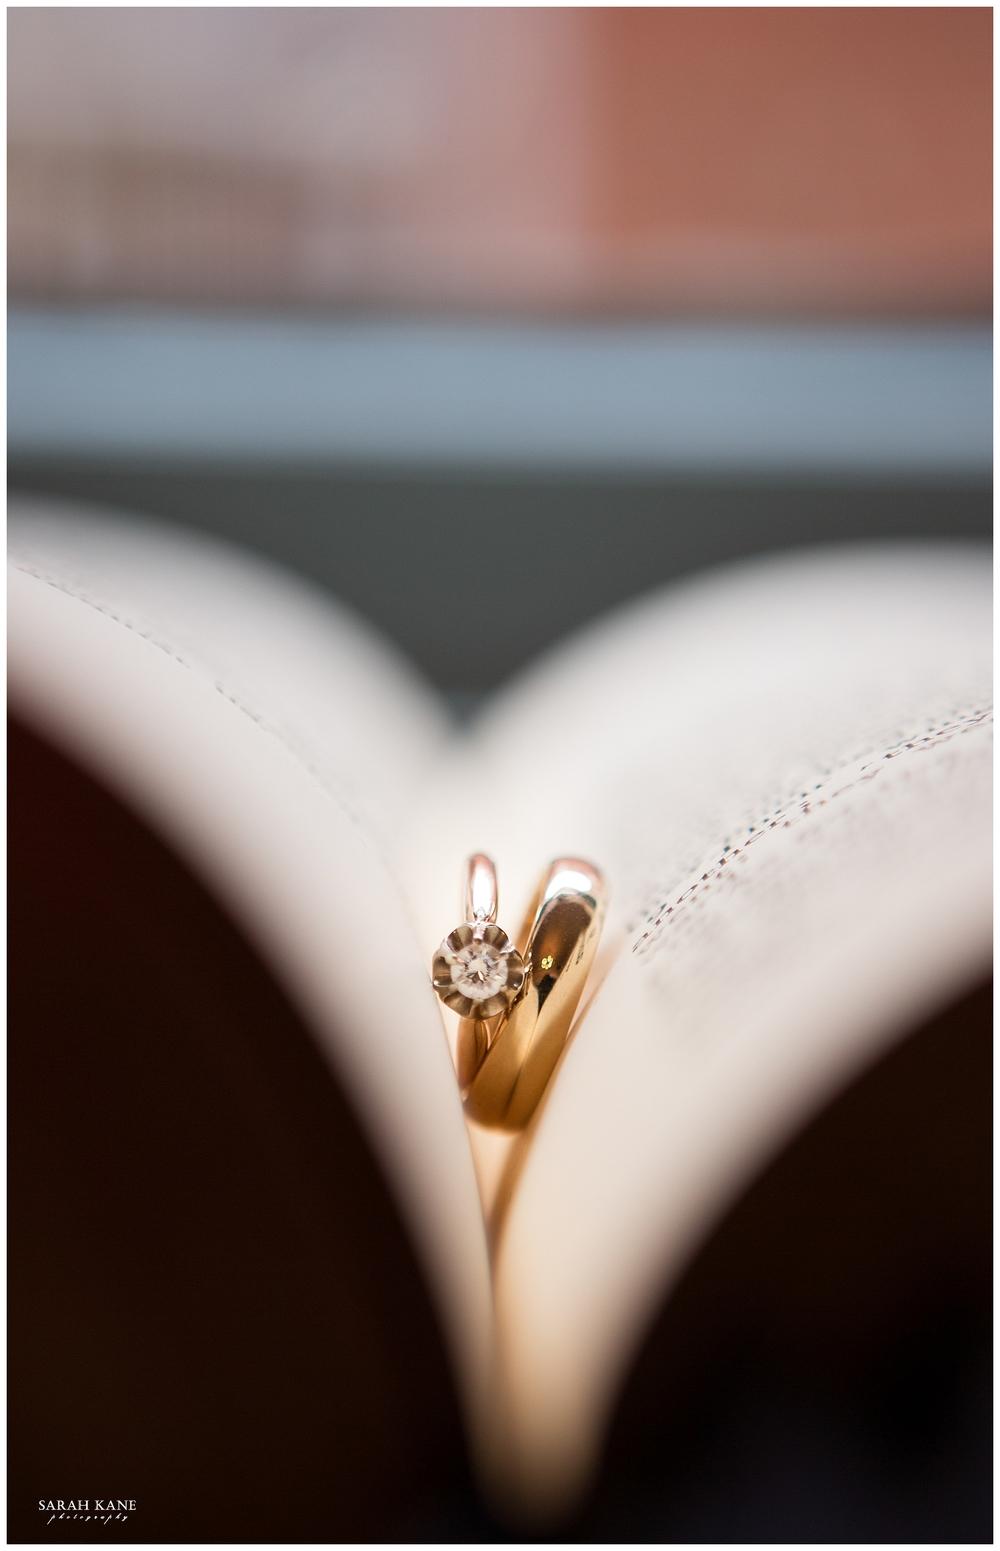 Robinson Theater - Sarah Kane Photography - Richmond Wedding Photographer008.JPG